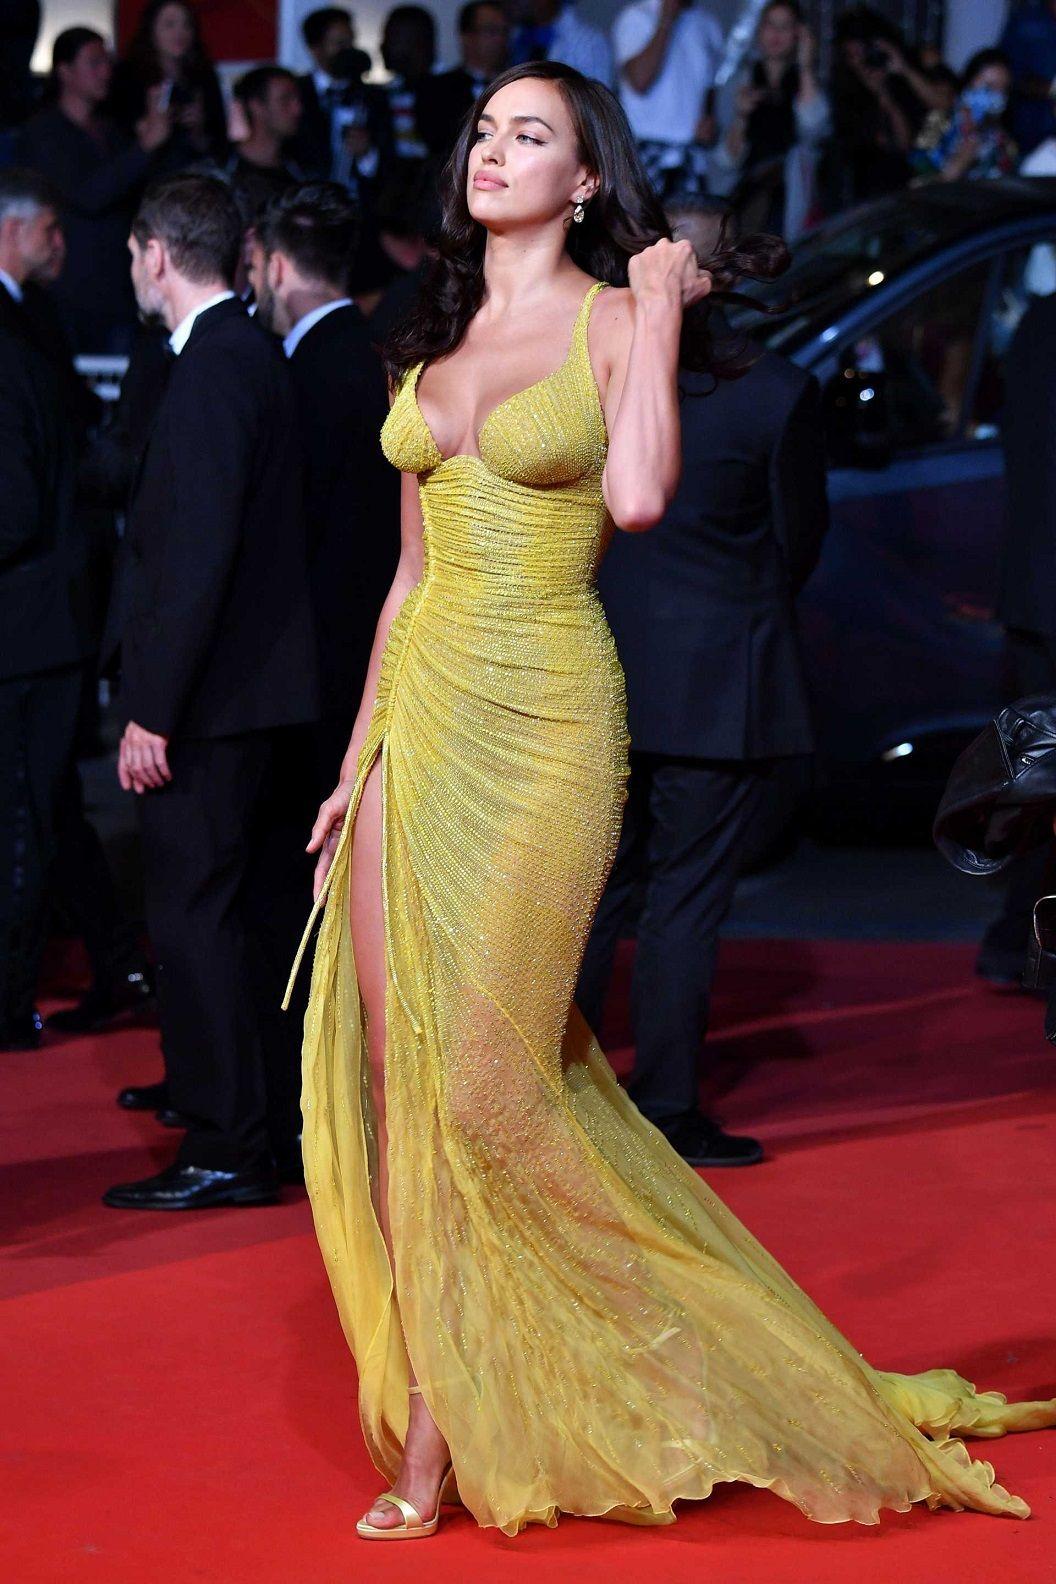 Irina Shayk Cleavage Nude Photos 1